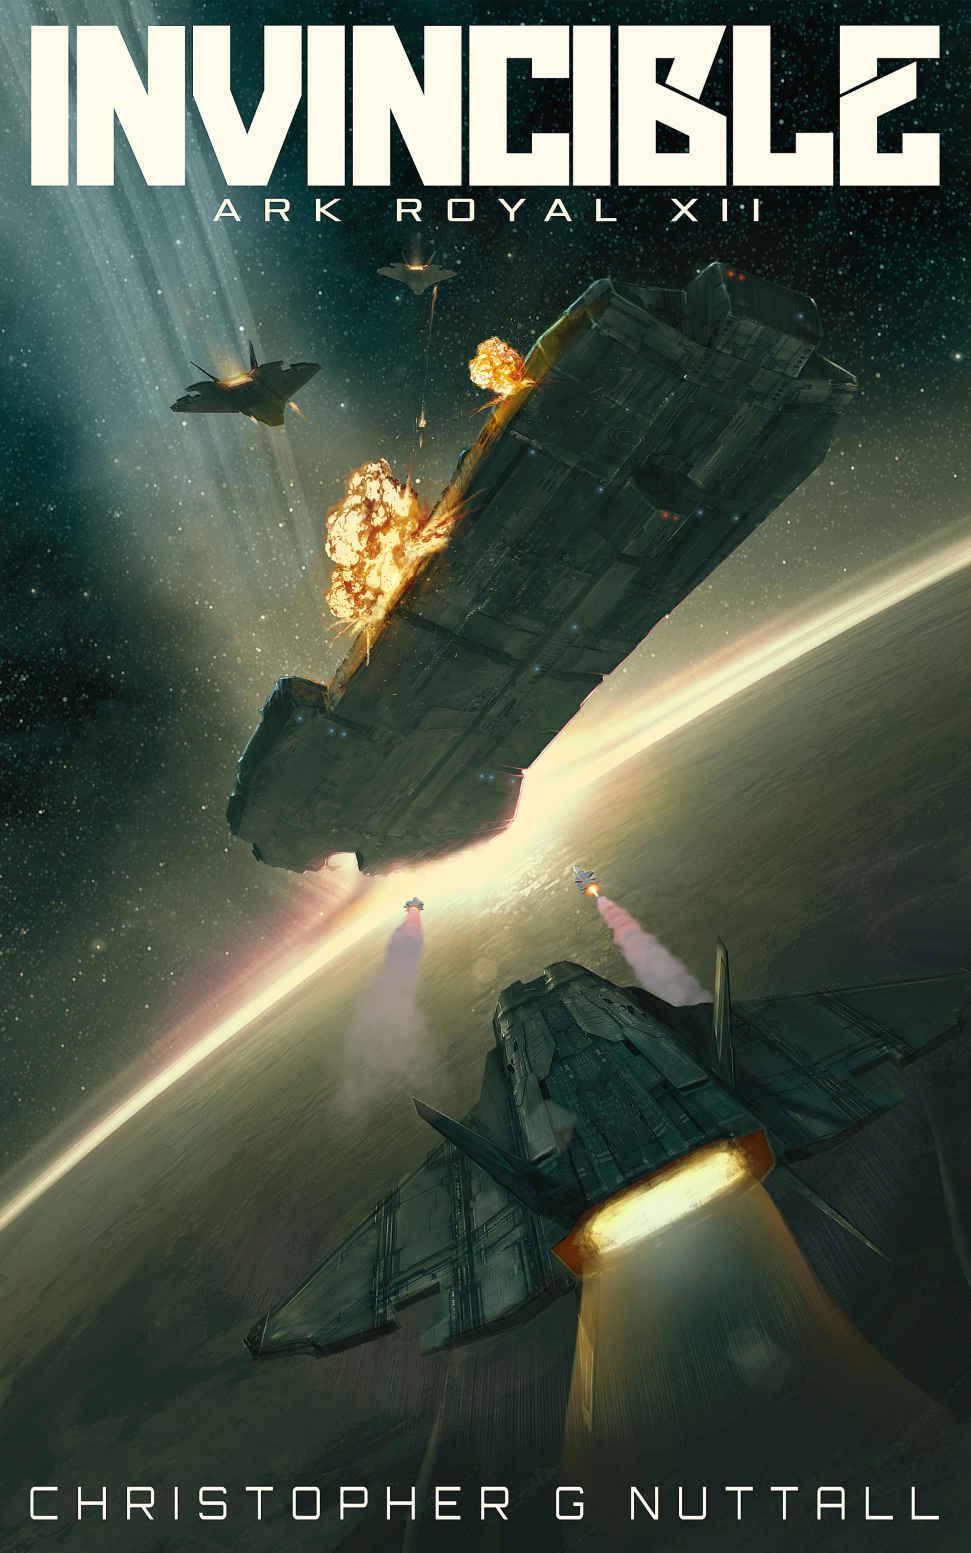 Invincible: Excellent military sci-fi adventure.